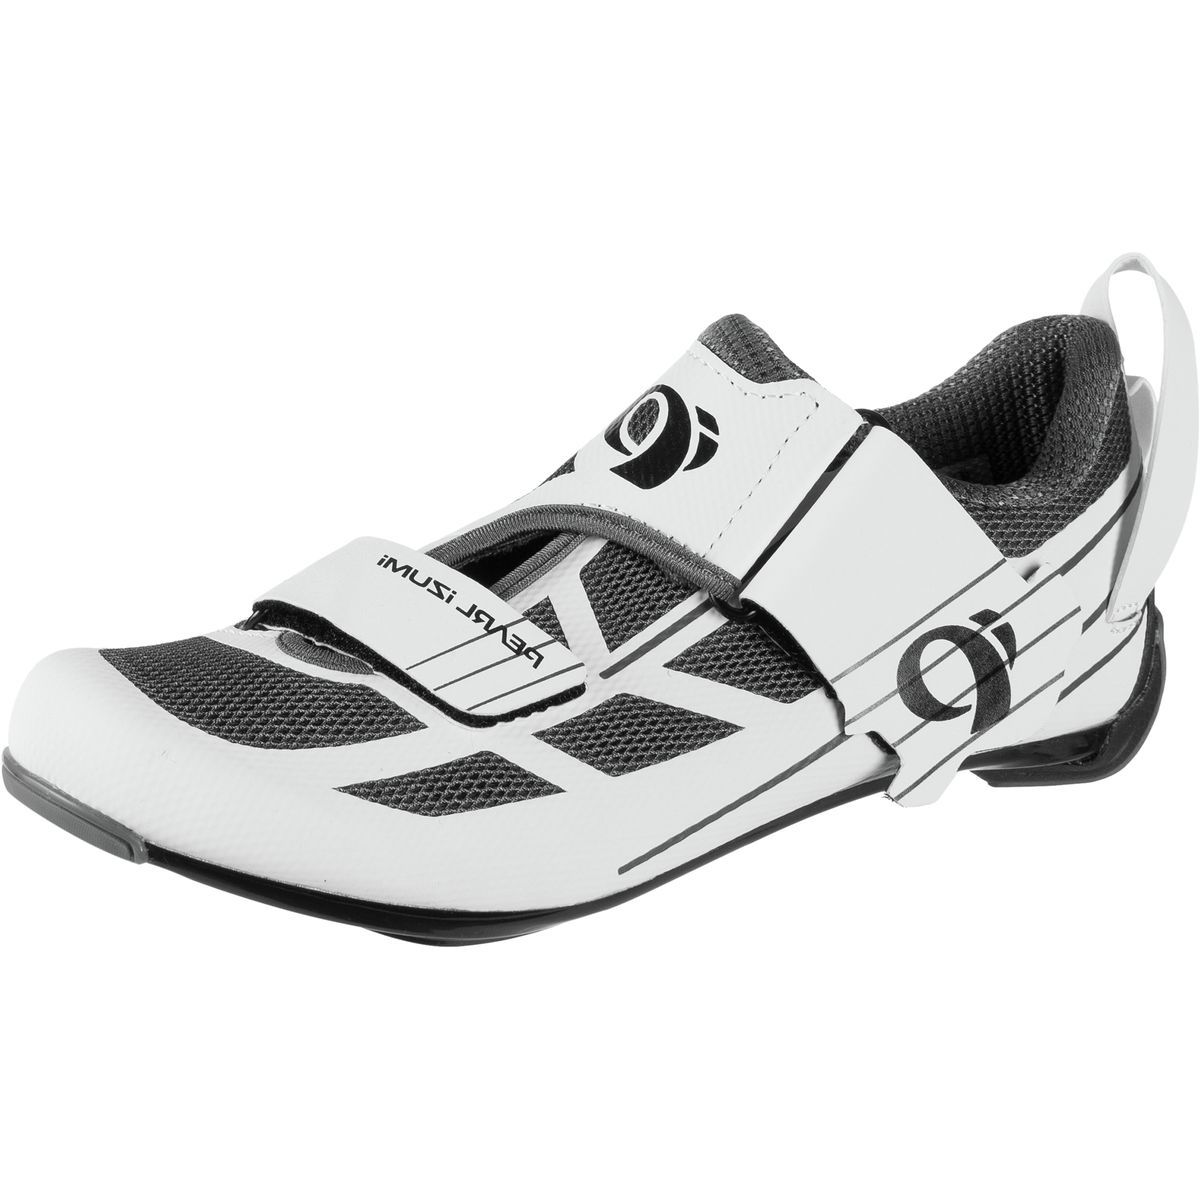 Pearl Izumi Tri Fly Select V6 Cycling Shoe - Women's